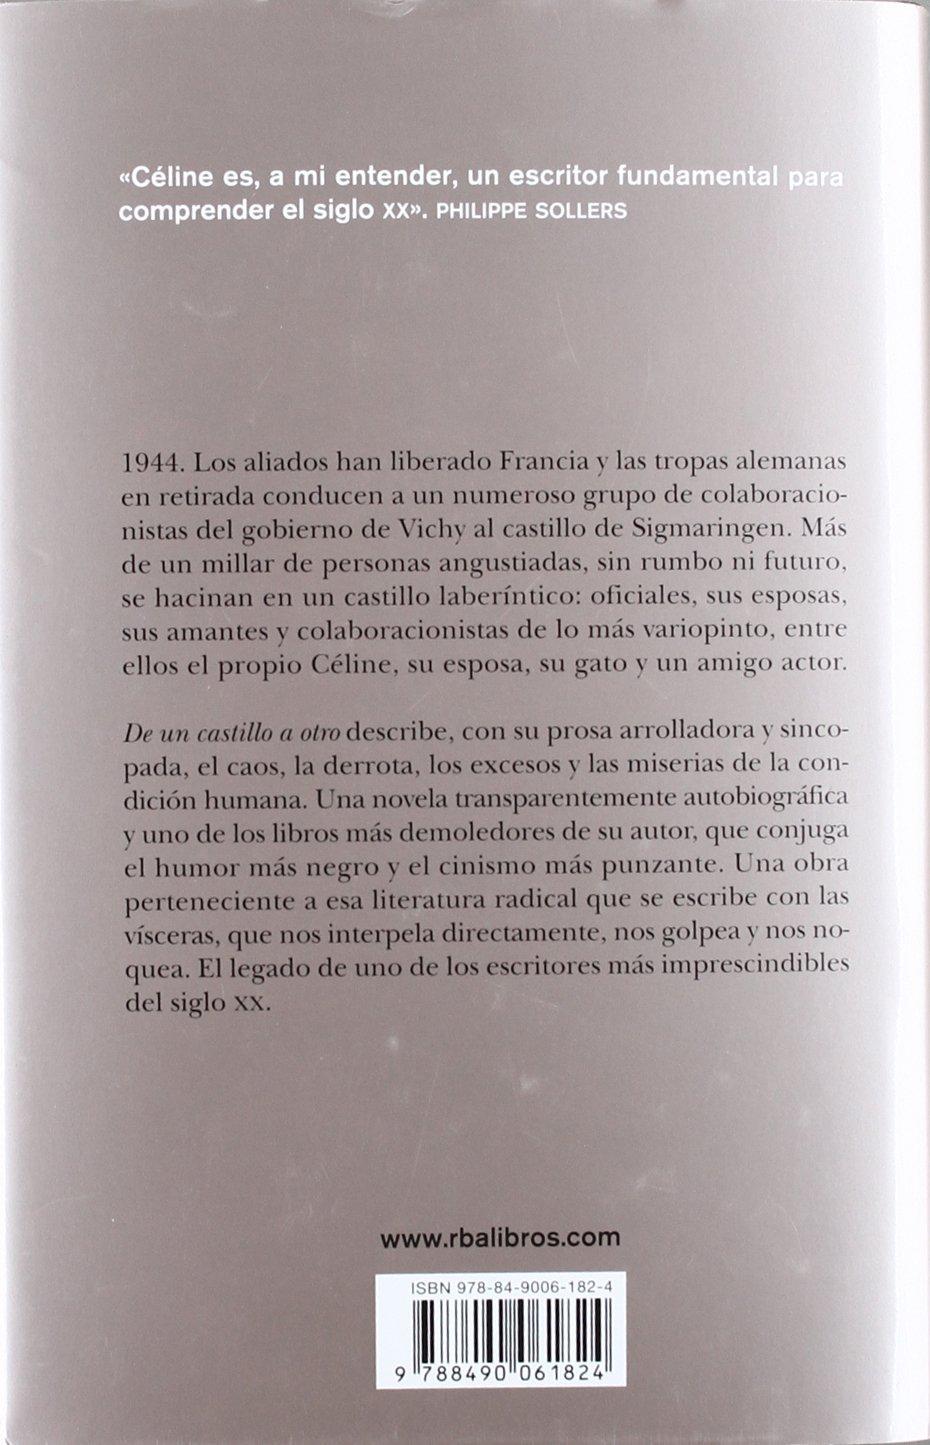 De un castillo a otro: Louis - Ferdinand Celine: 9788490061824: Amazon.com: Books